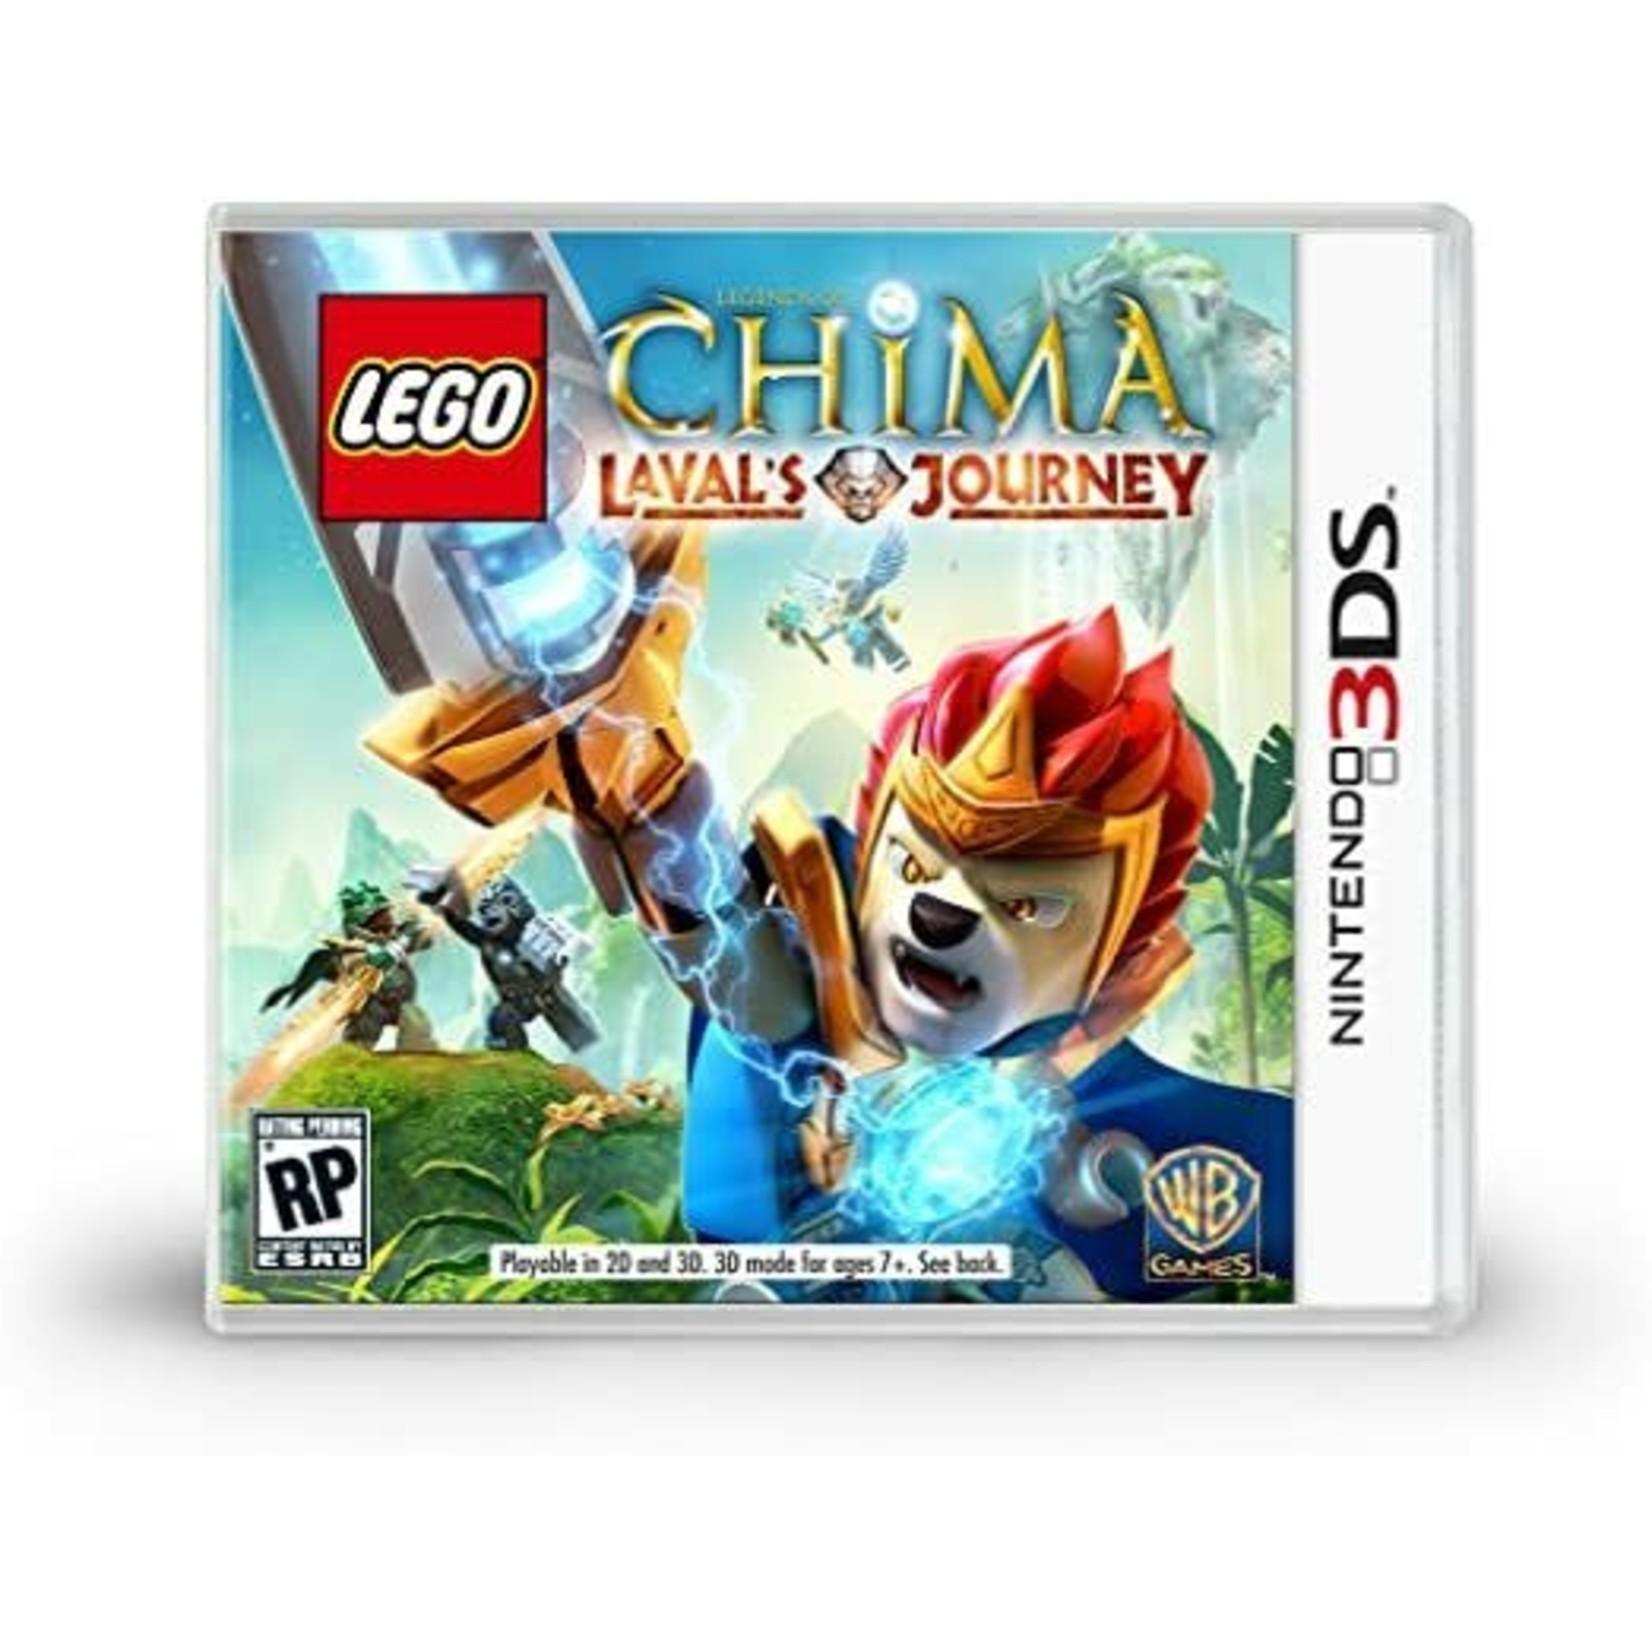 3DSU-Lego chima laval's journey